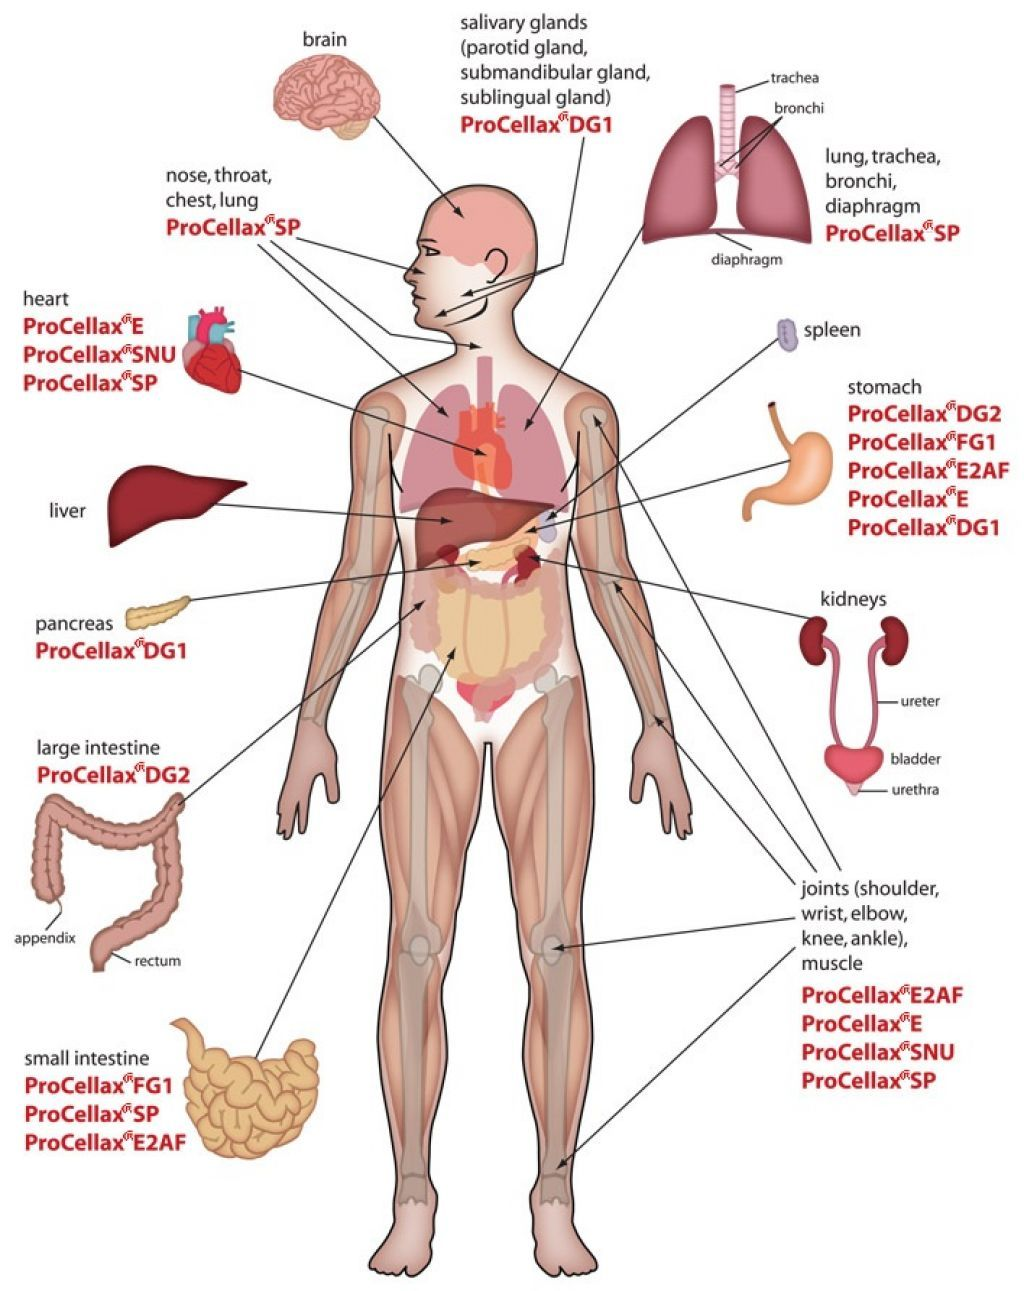 Human Body Anatomy Internal Organs Diagram.